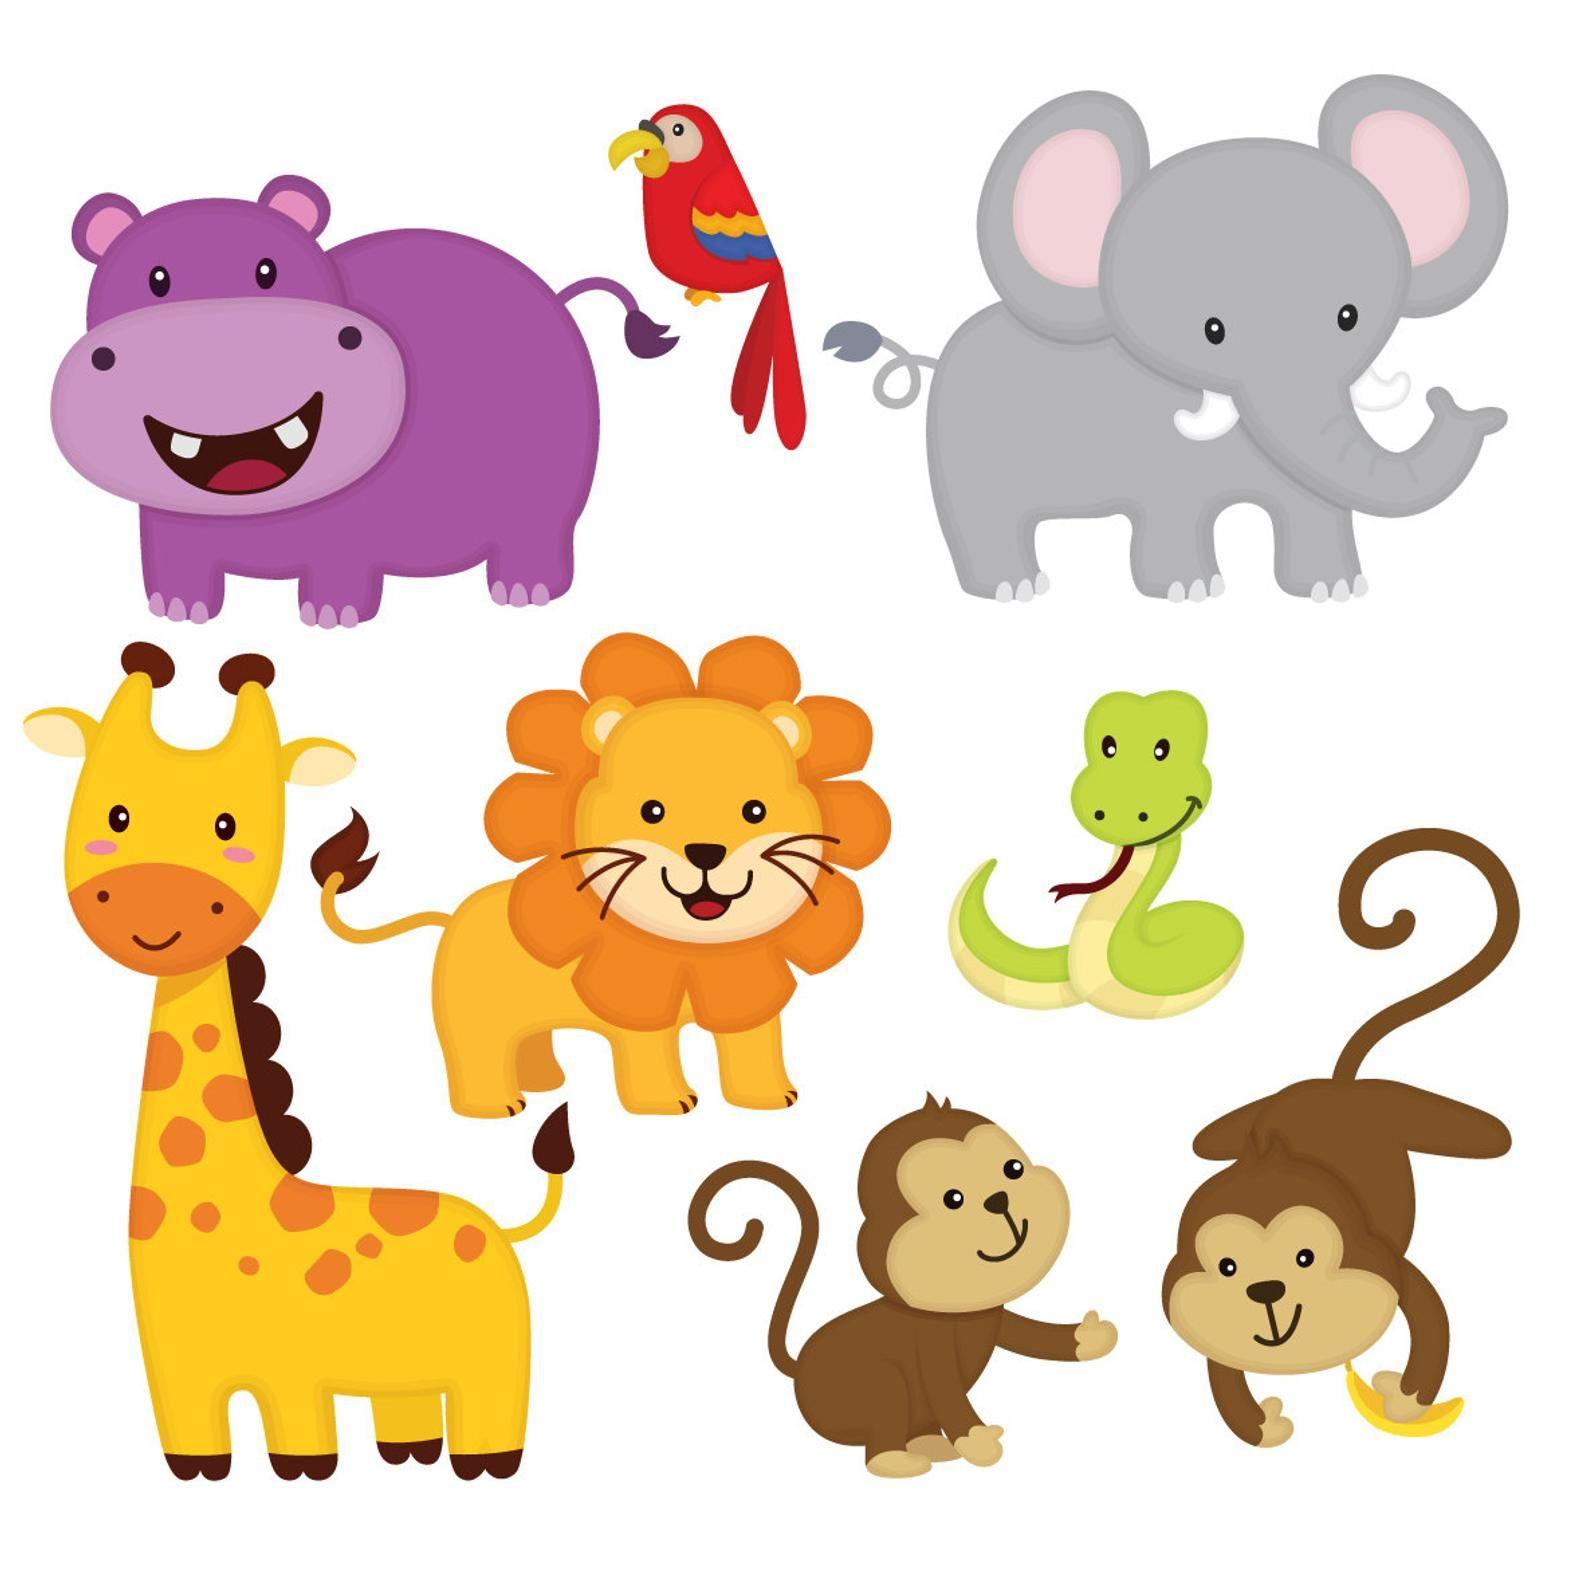 Jungle Animal Clip Art Jungle Friends Sticker Jungle Animal Etsy In 2021 Cute Animal Clipart Animal Clipart Free Animal Clipart